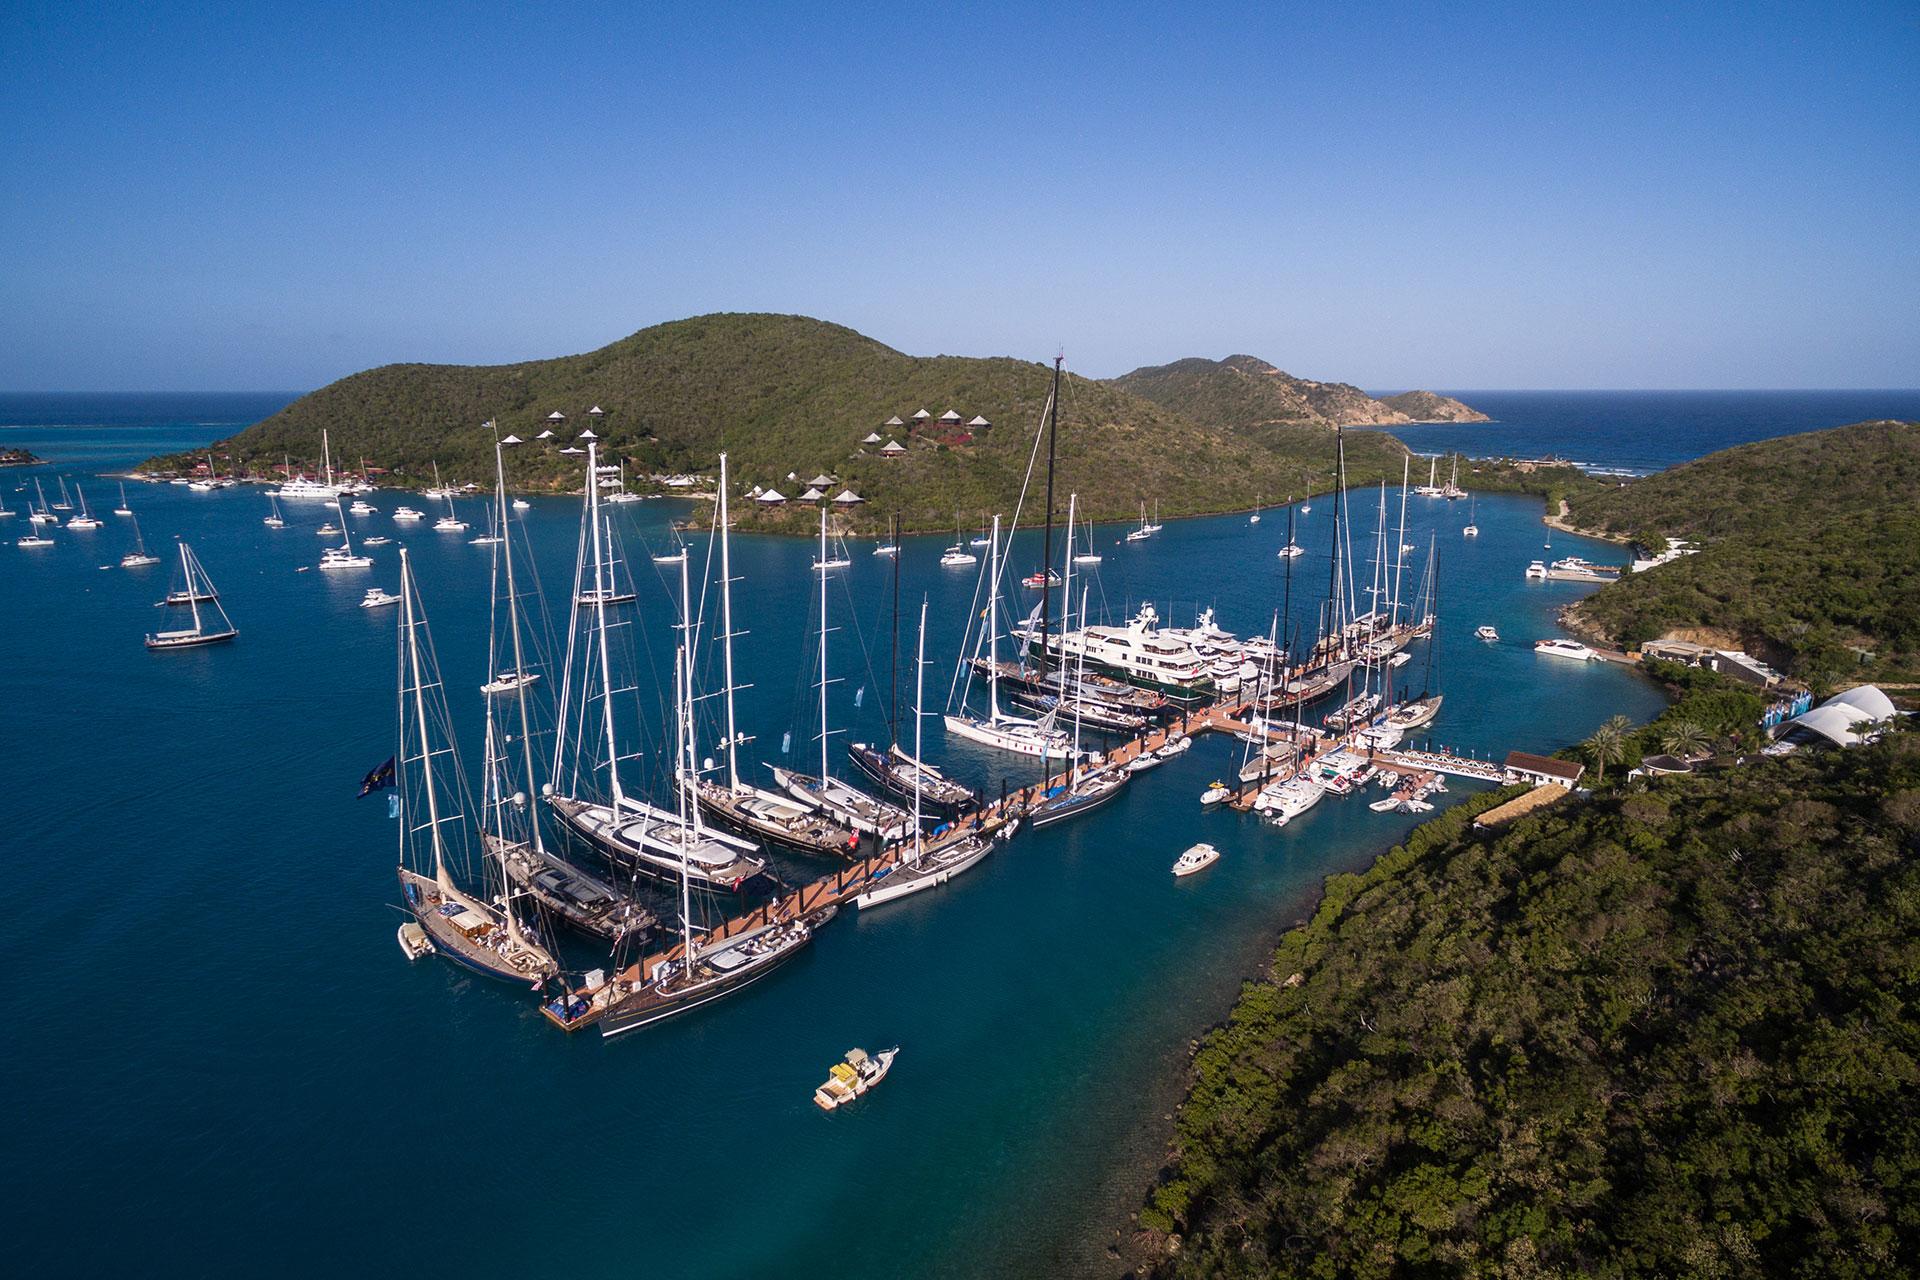 Yacht Club Costa Smeralda - Virgin Gorda - Home 466874dba5b